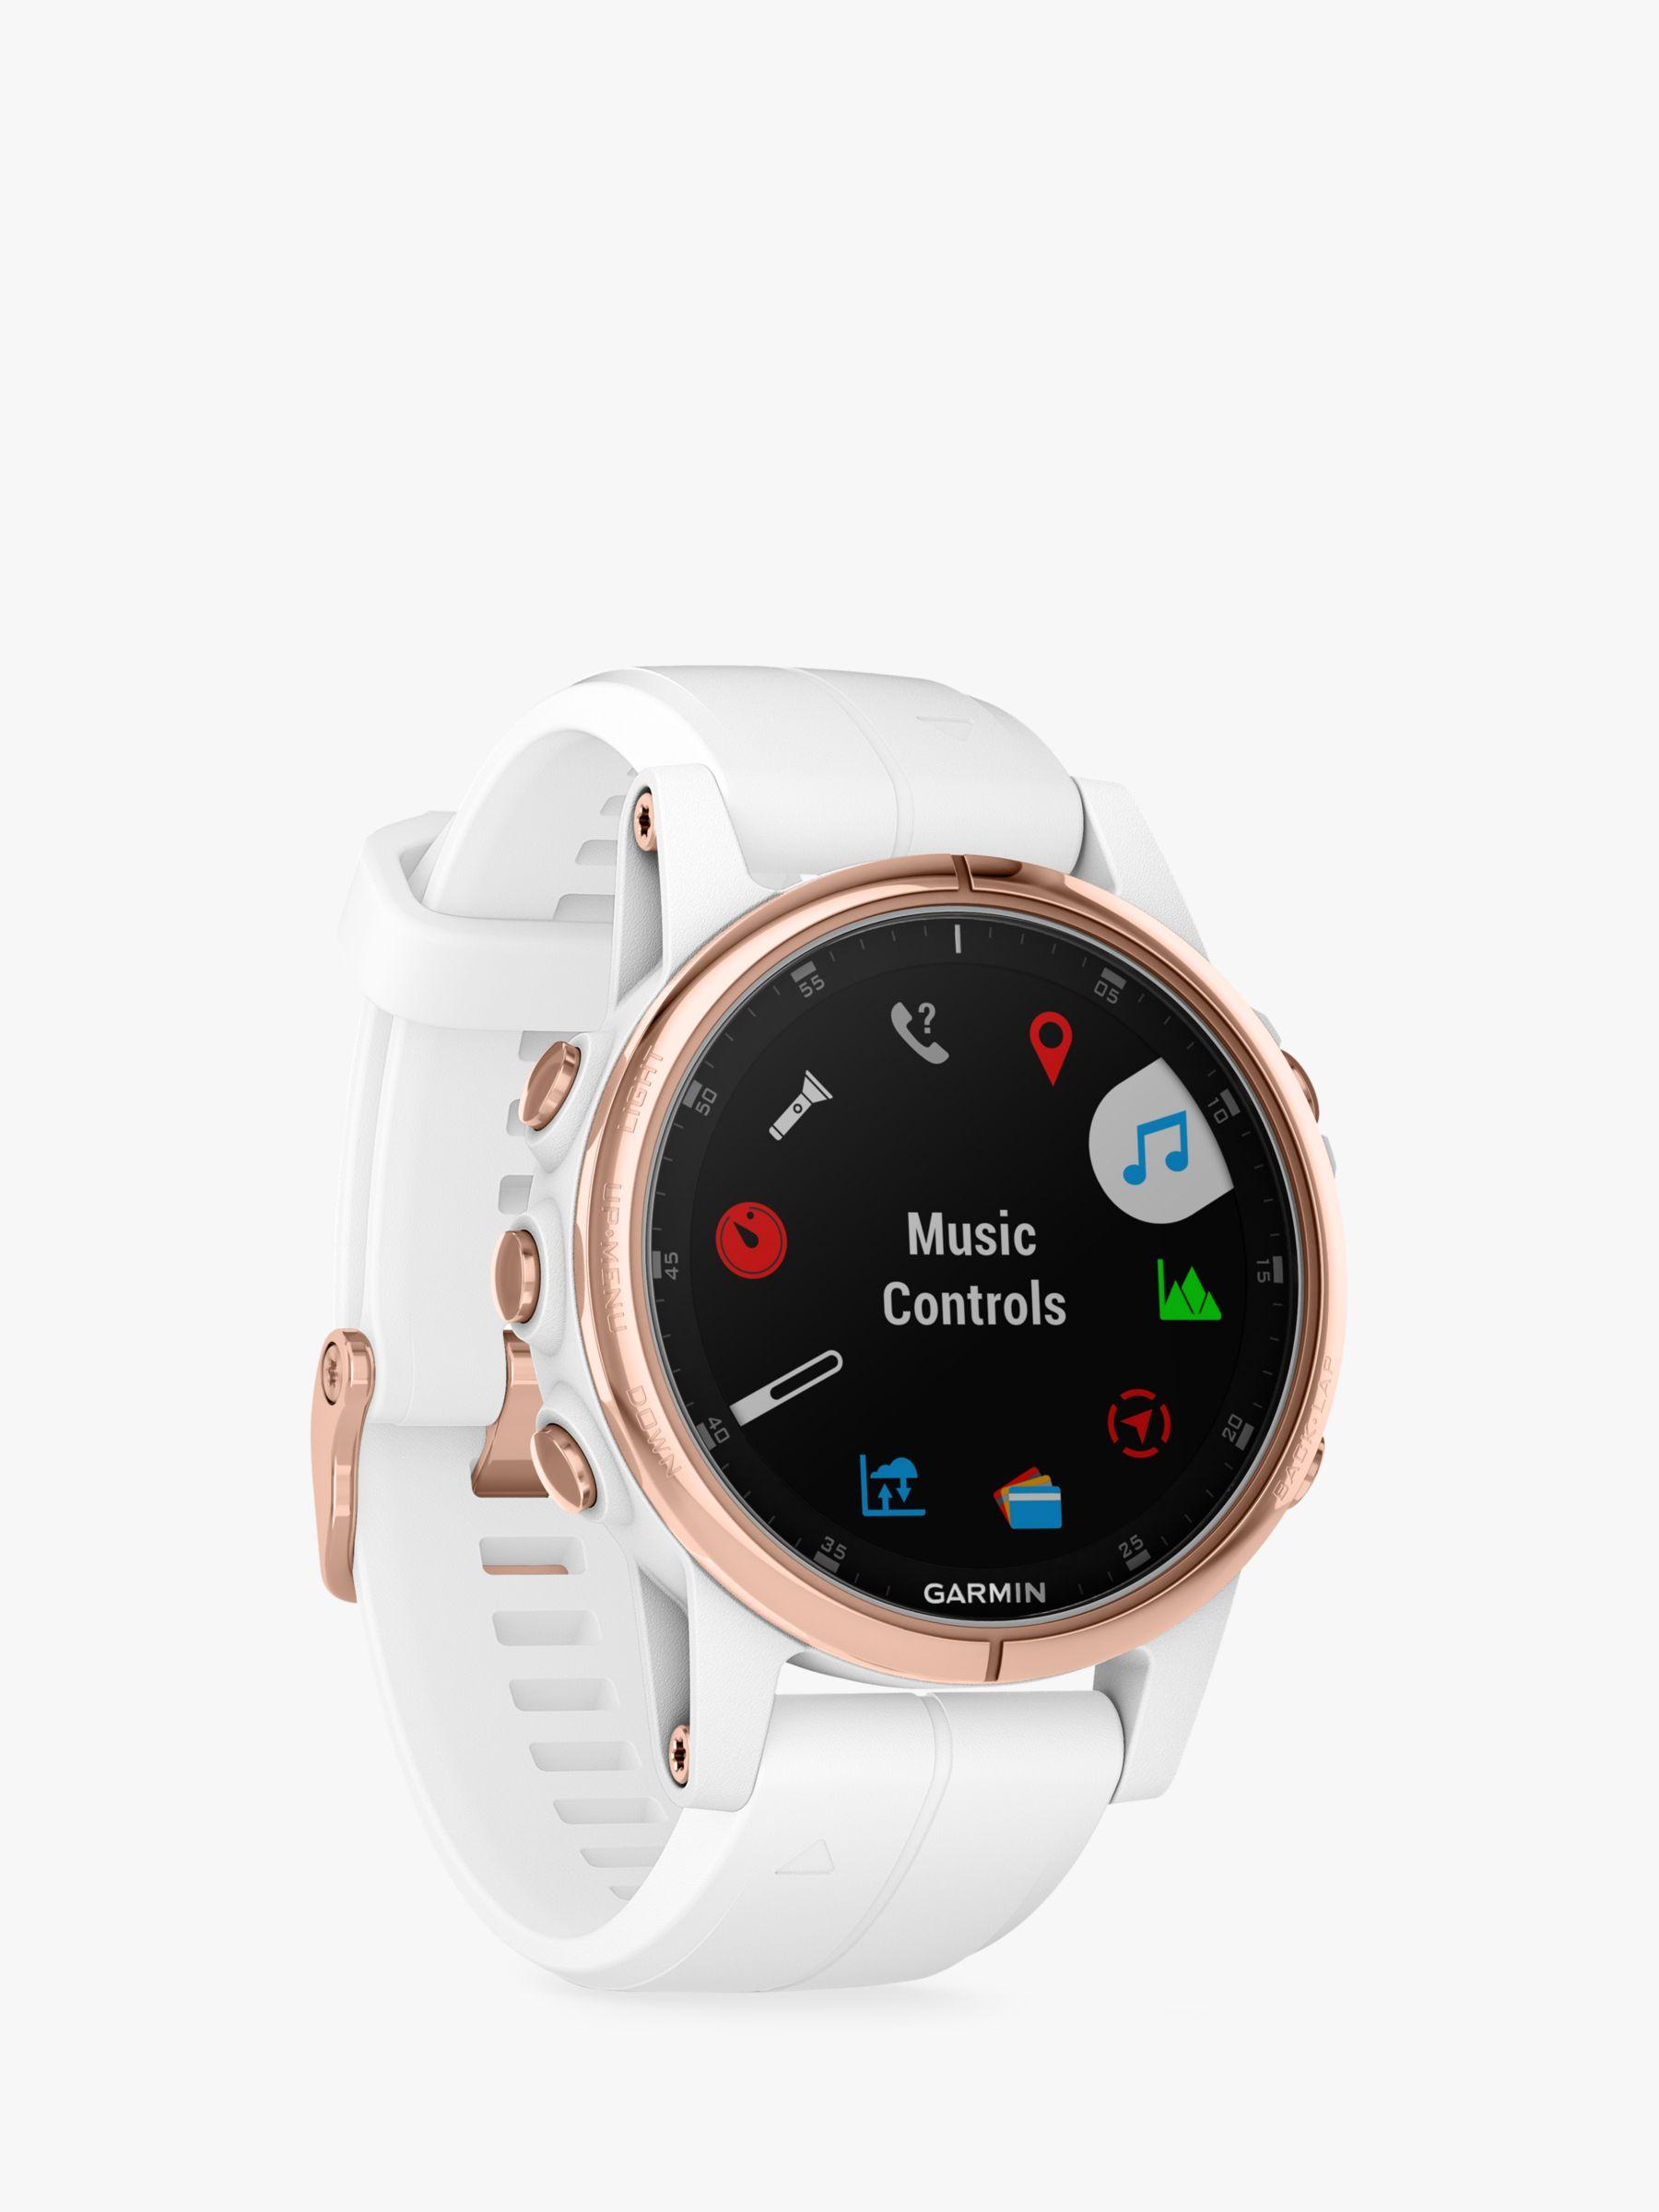 Garmin Garmin fēnix 5S Plus Sapphire GPS Multisport Watch, Rose Gold with White / Rose Gold Band, 4.2cm